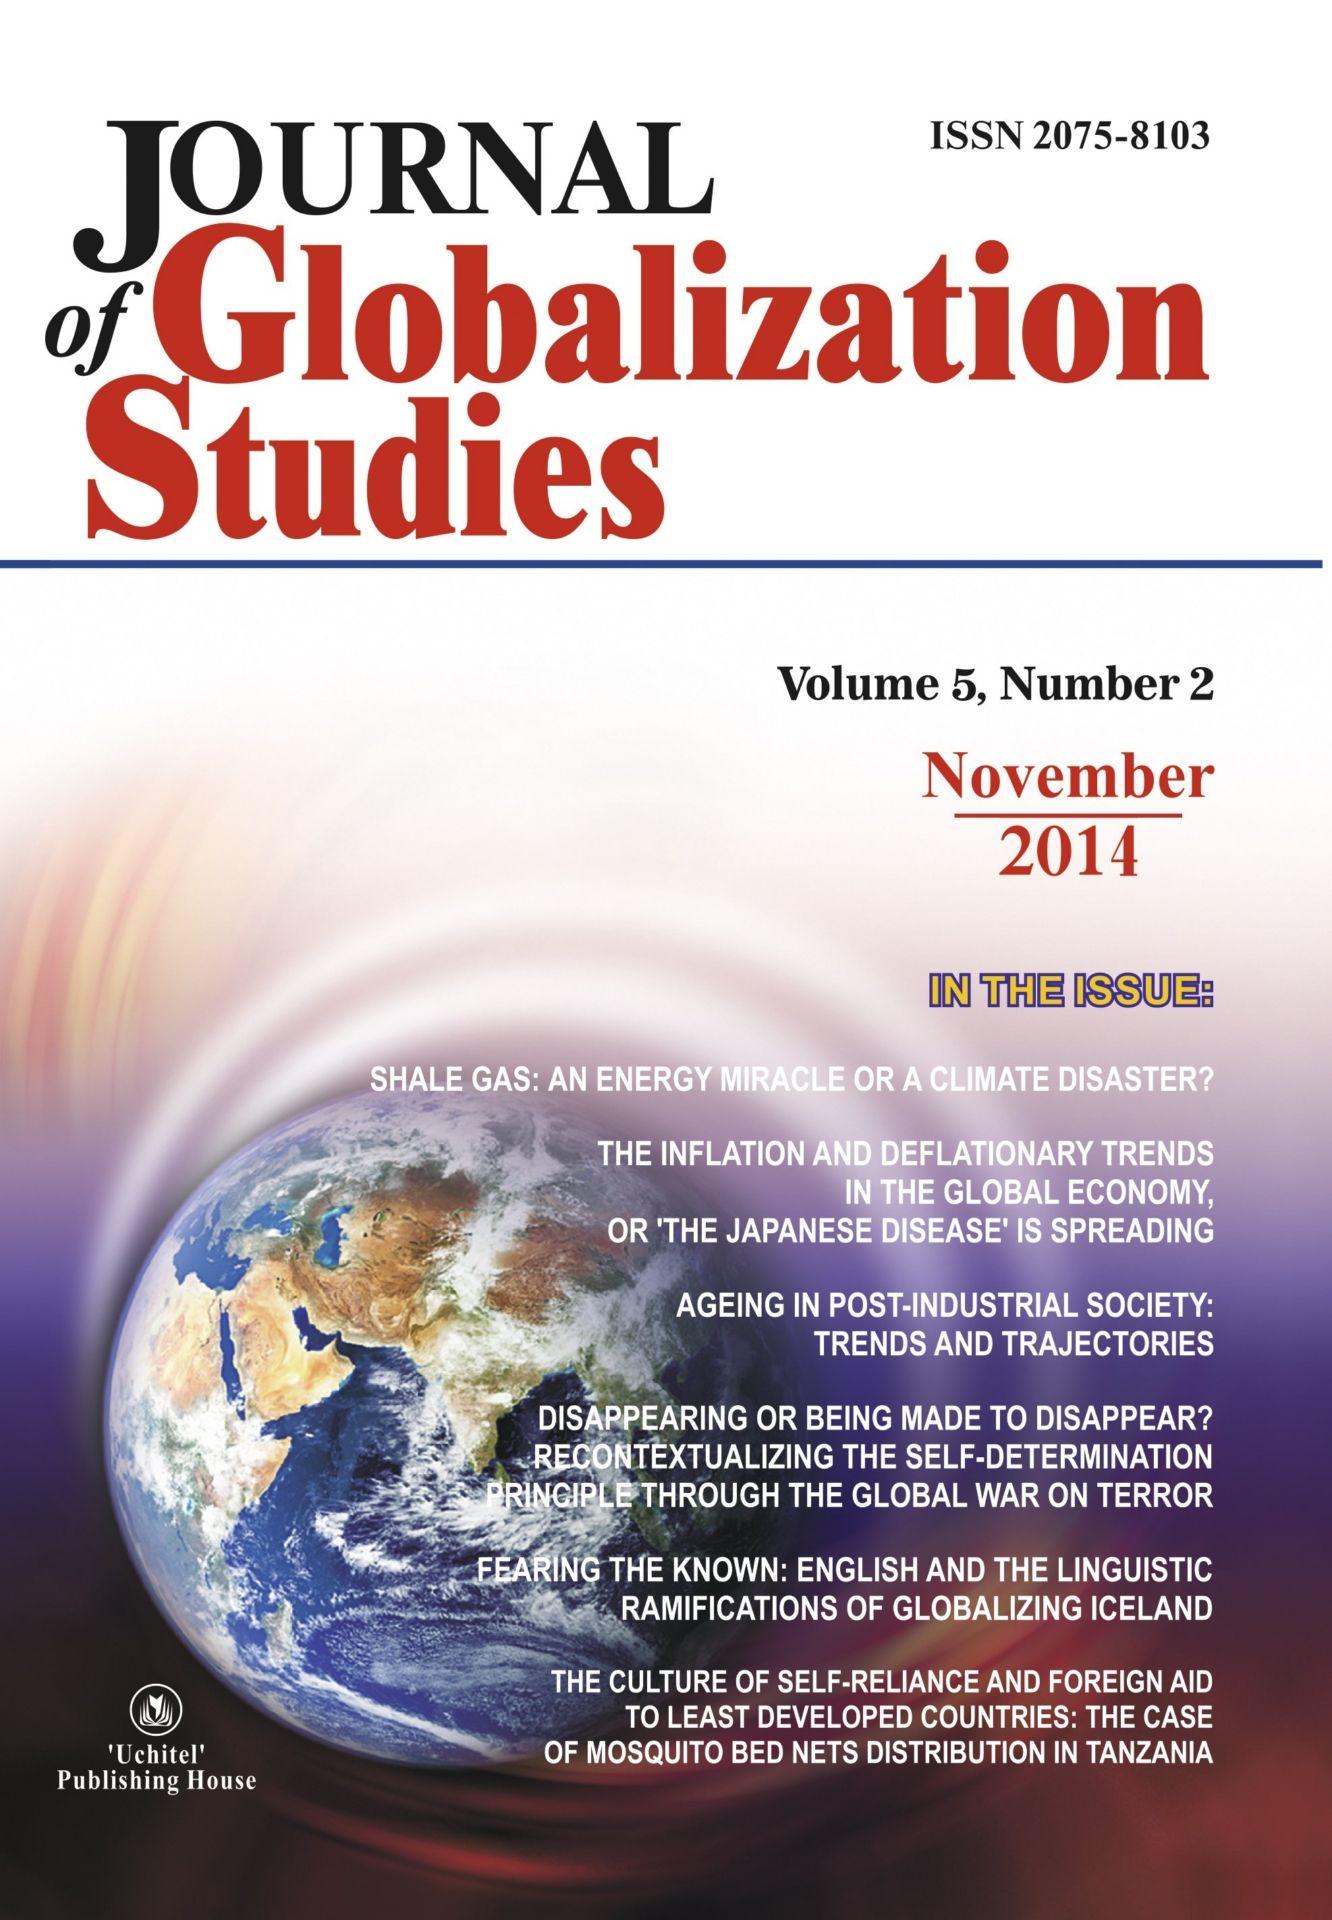 """Journal of Globalization Studies"" Volume 5, Number 2, 2014 г. ""Журнал глобализационных исследований"" Международный журнал на английском языке"